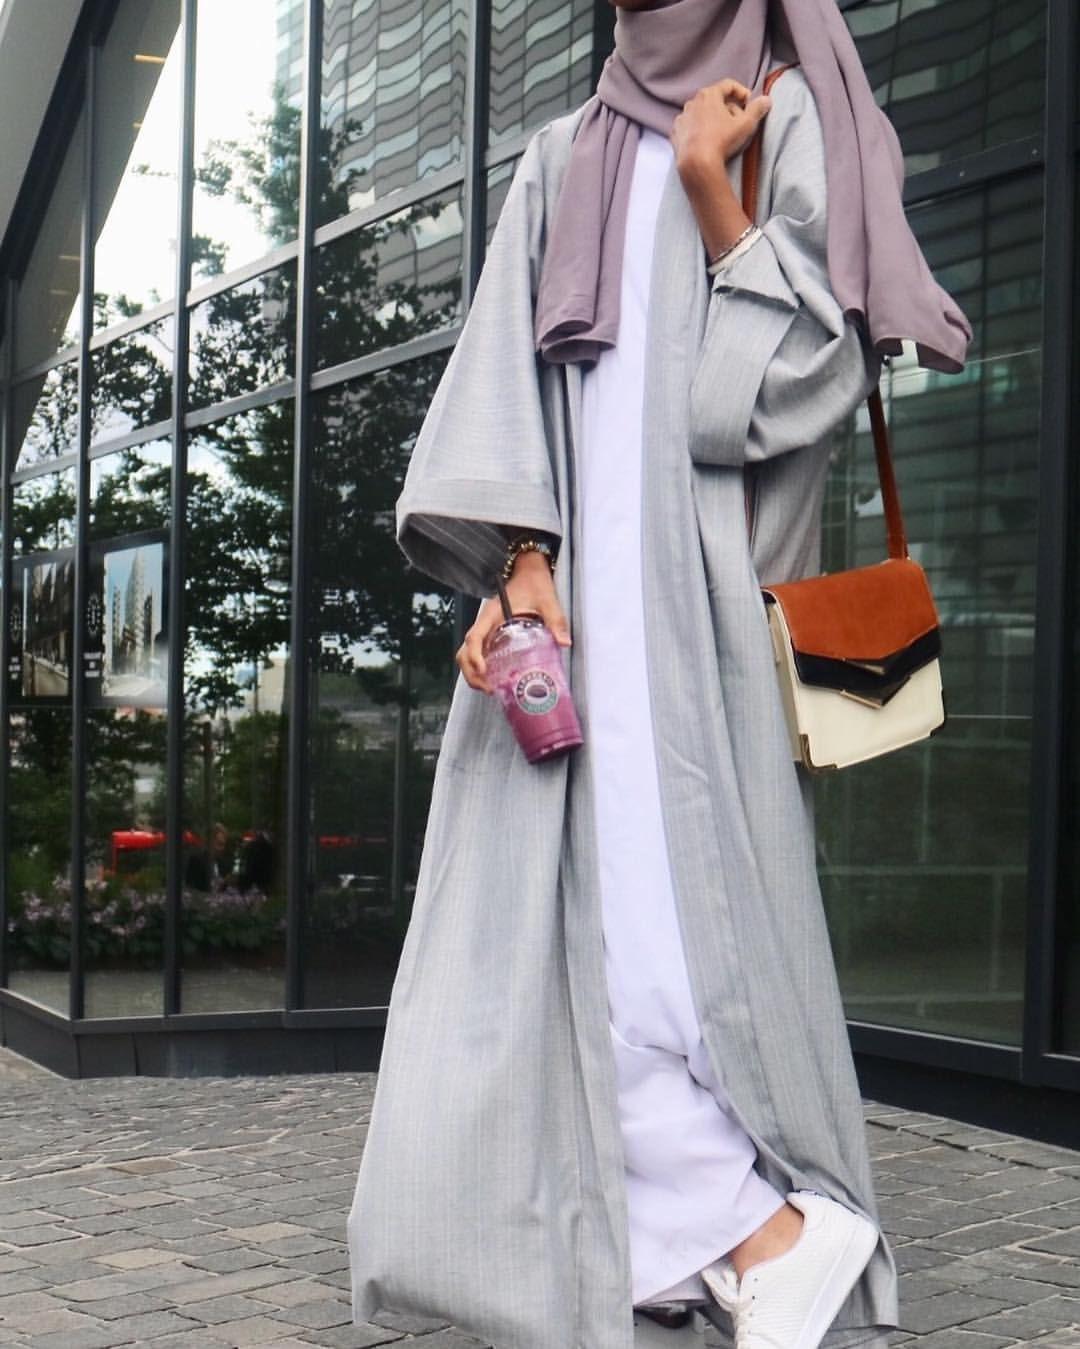 Rawdis Modest Fashion In 2018 Pinterest Hijab Busana Muslim Abaya Layla Phasmina Modern Baju Chic